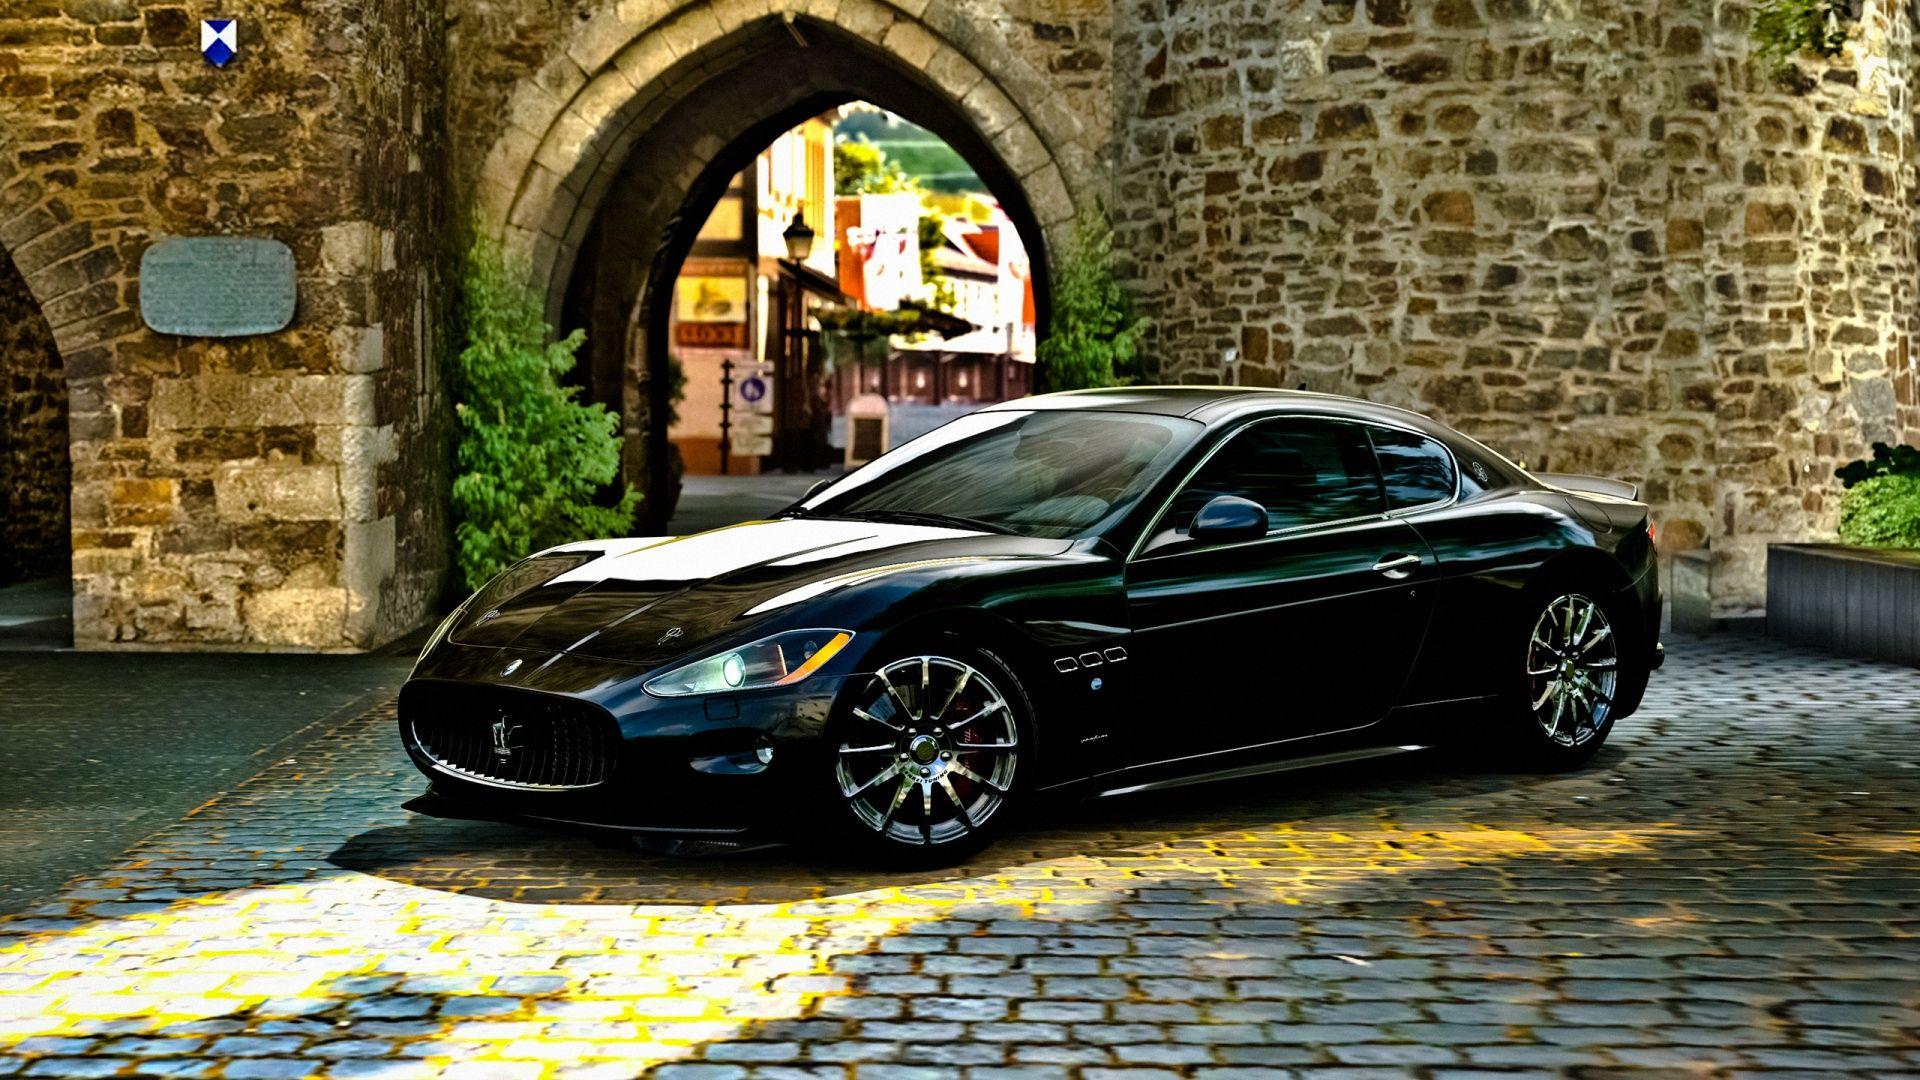 More Awesome Cars Here Https Goo Gl Wwxuqe Cars Dogde Nissan Bmw Maserati Car Maserati Maserati Granturismo